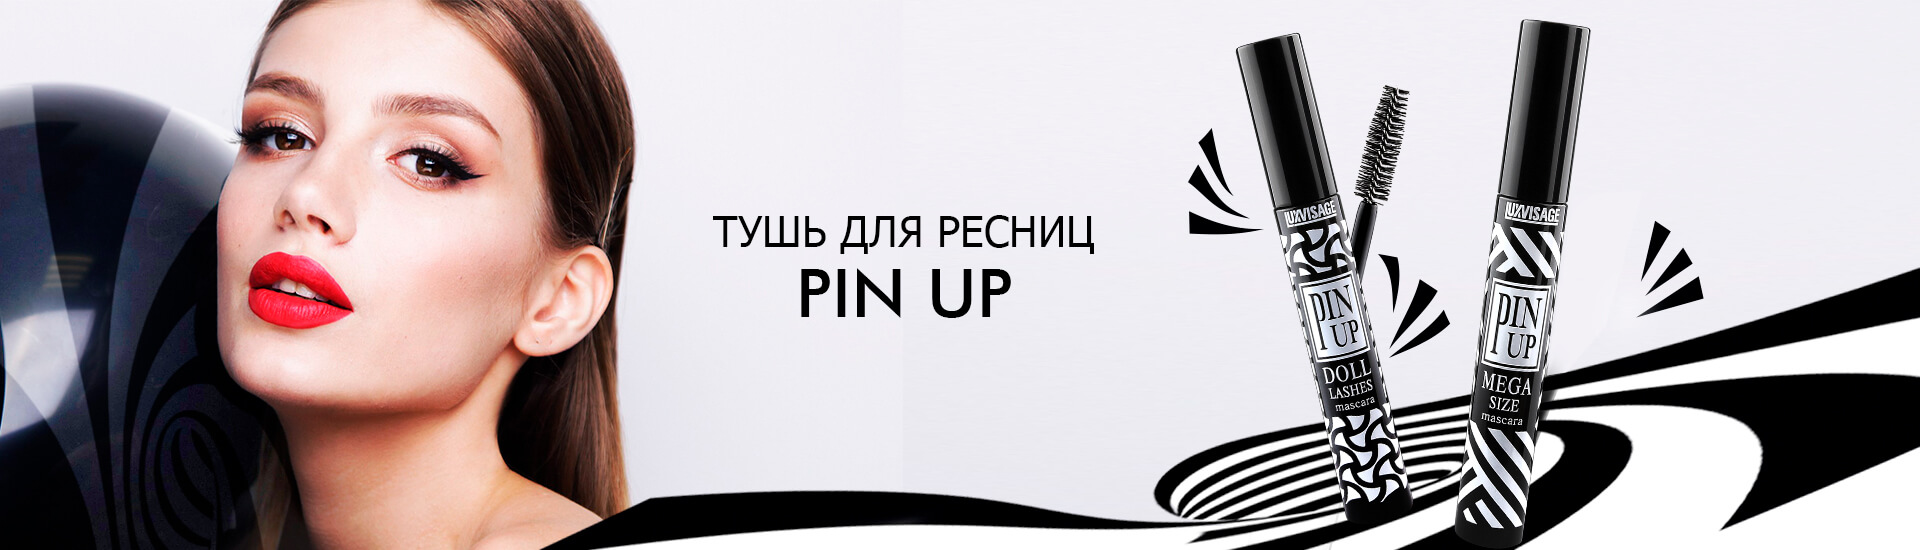 Pin Up зеркало для входа